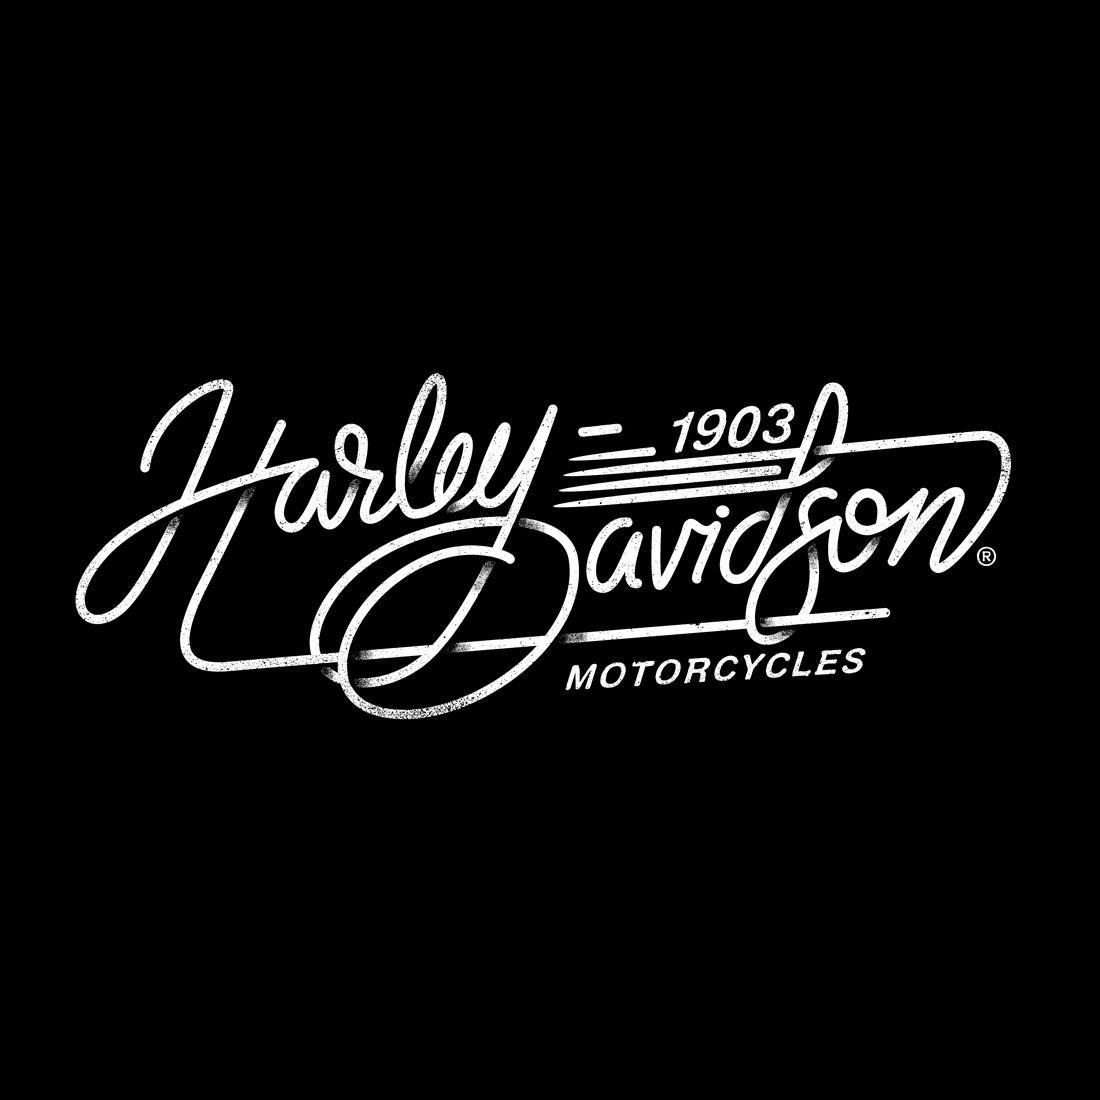 Harley Davidson Tee Iilustrationsalex Ramon Mas Studio Harley Davidson Stickers Harley Davidson Images Harley Davidson [ 1100 x 1100 Pixel ]